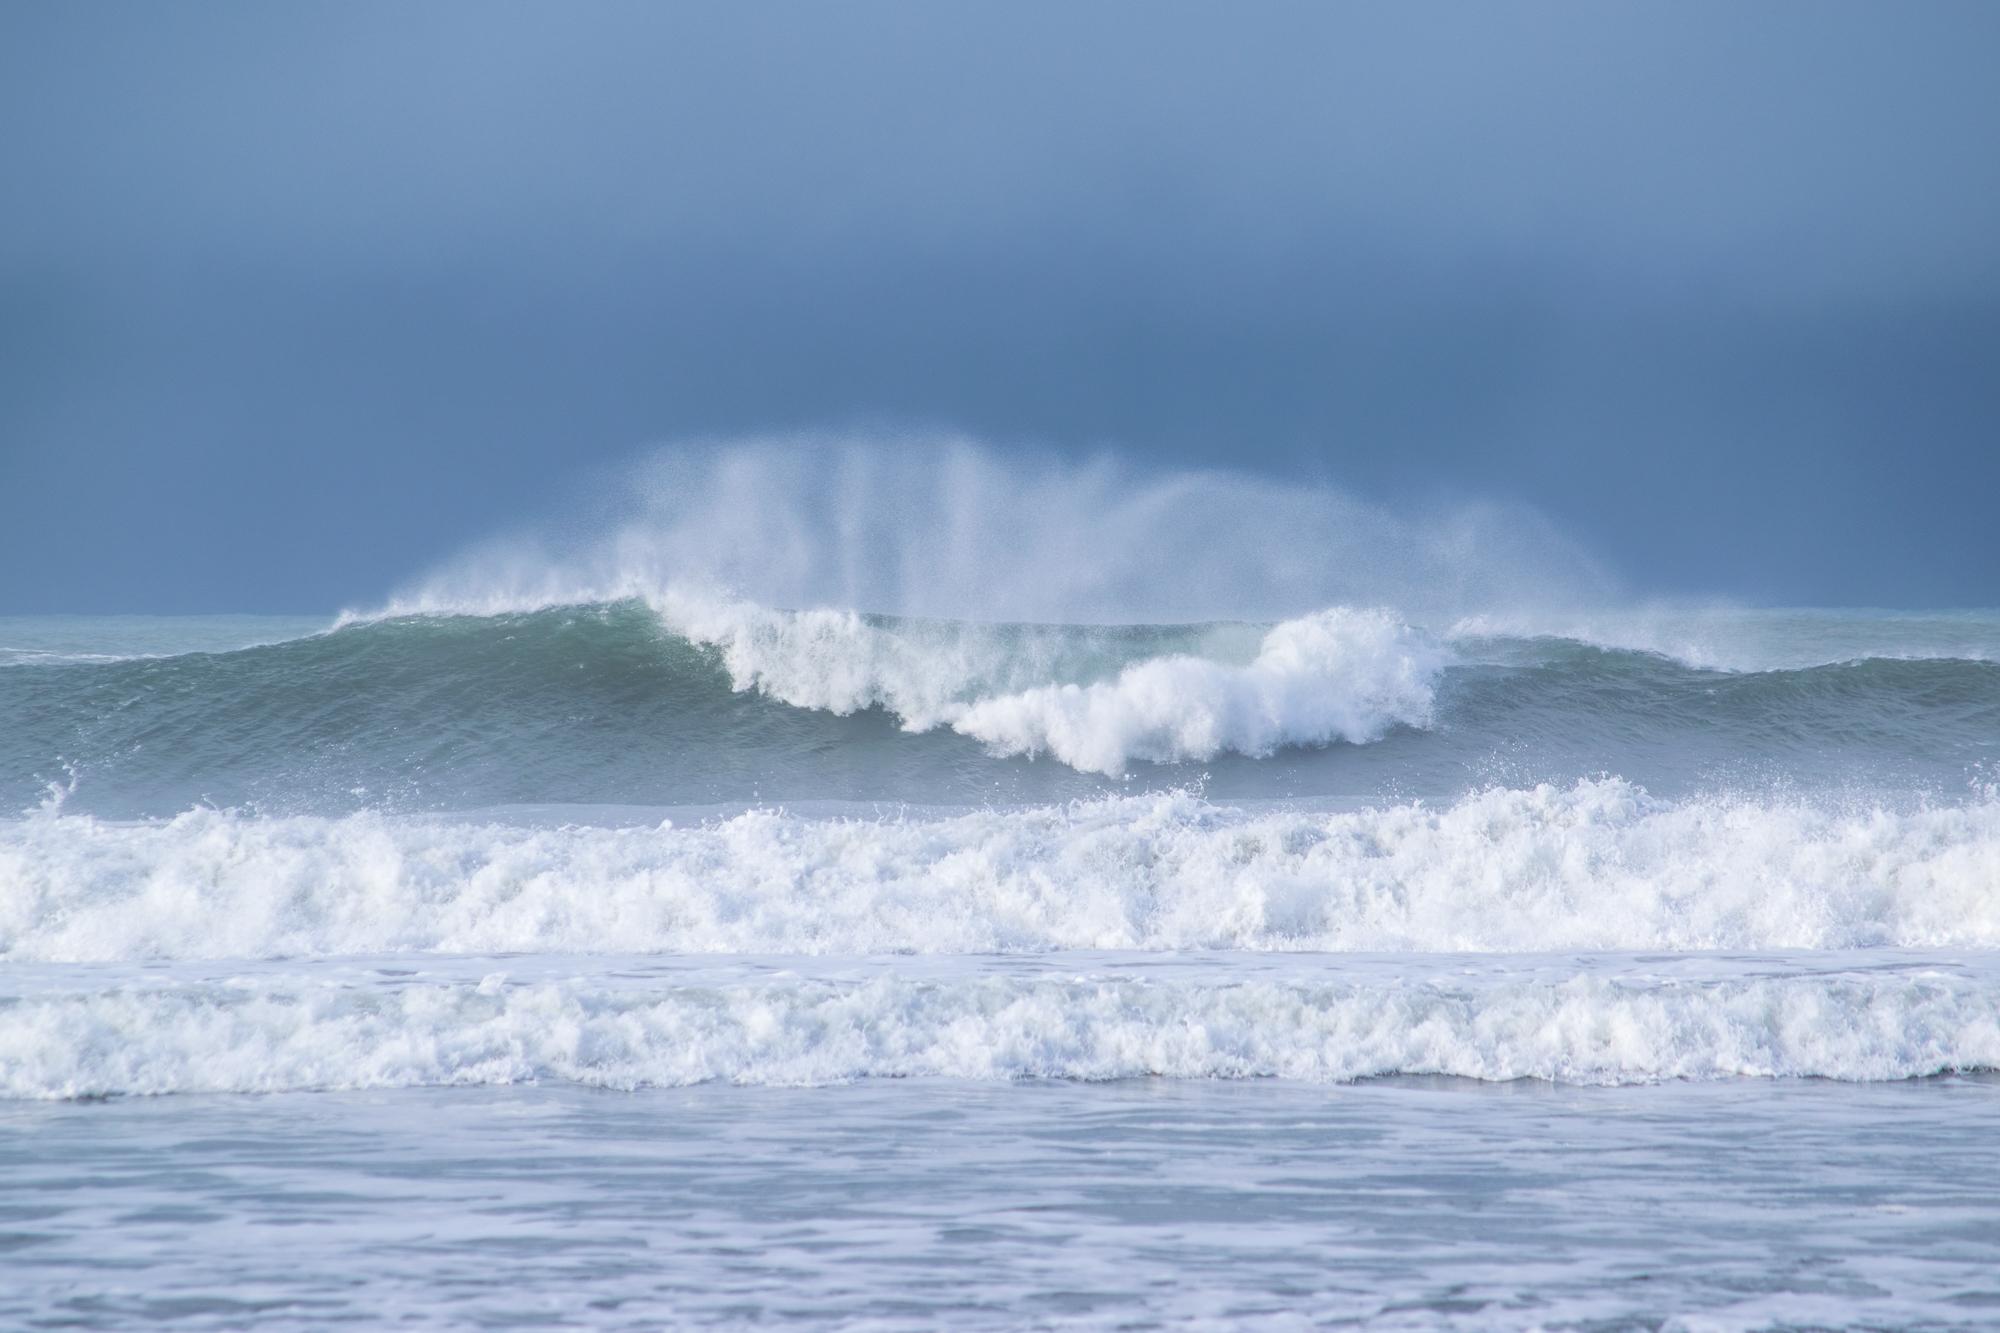 Anthem_ocean waves stock.jpg